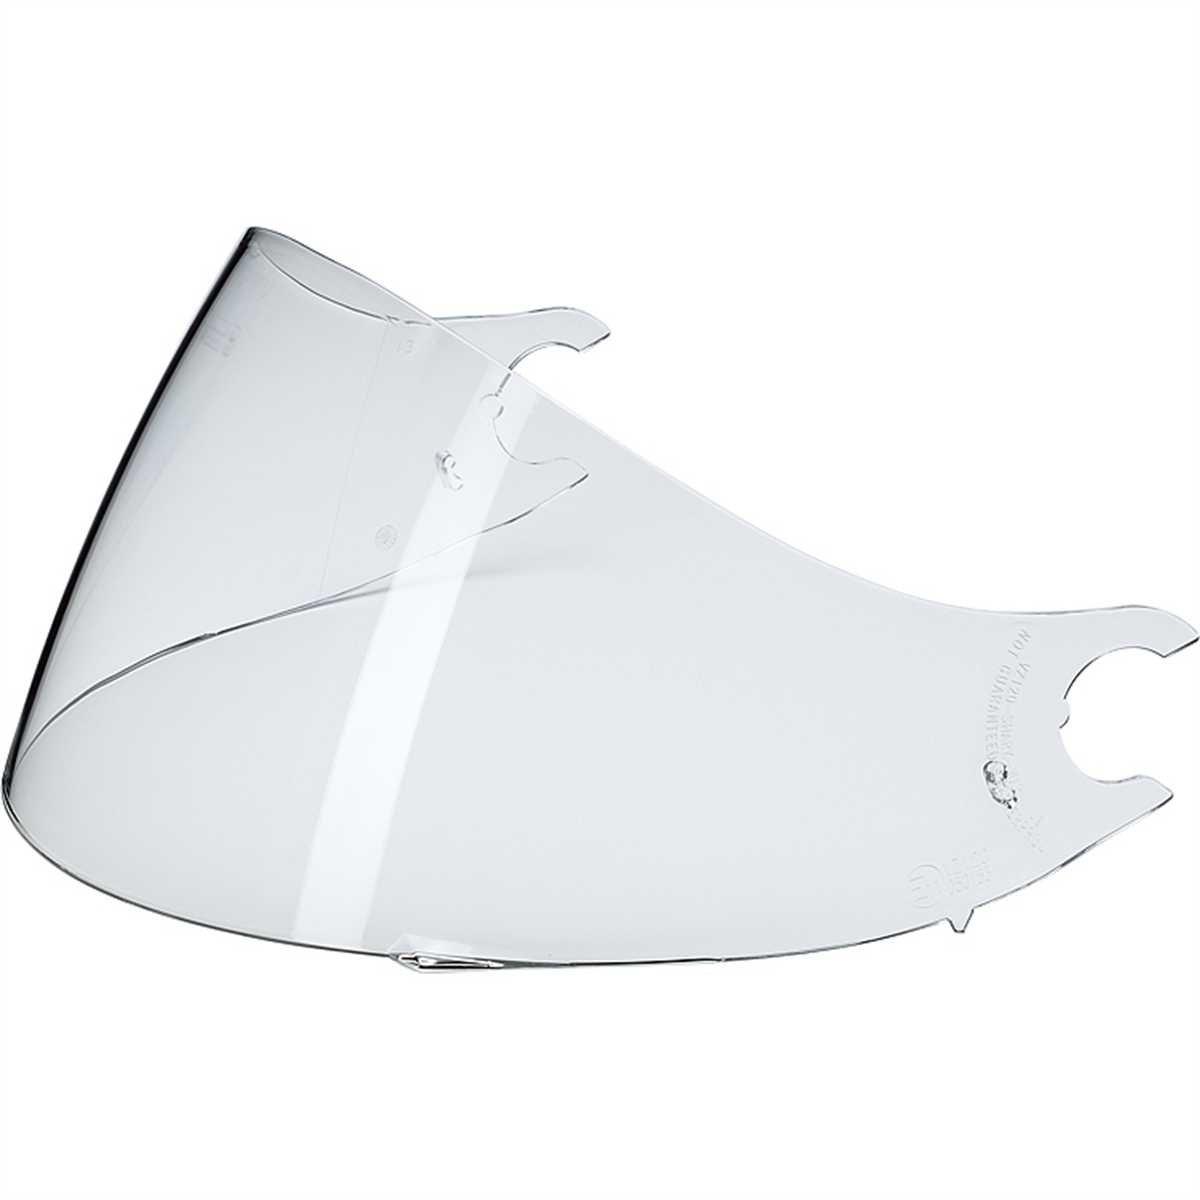 VZ12025PINCTU - Shark Vision-R GT Carbon / Vision-R / Explore-R Visor Clear Anti-Scratch Anti-Fog 3599181100458